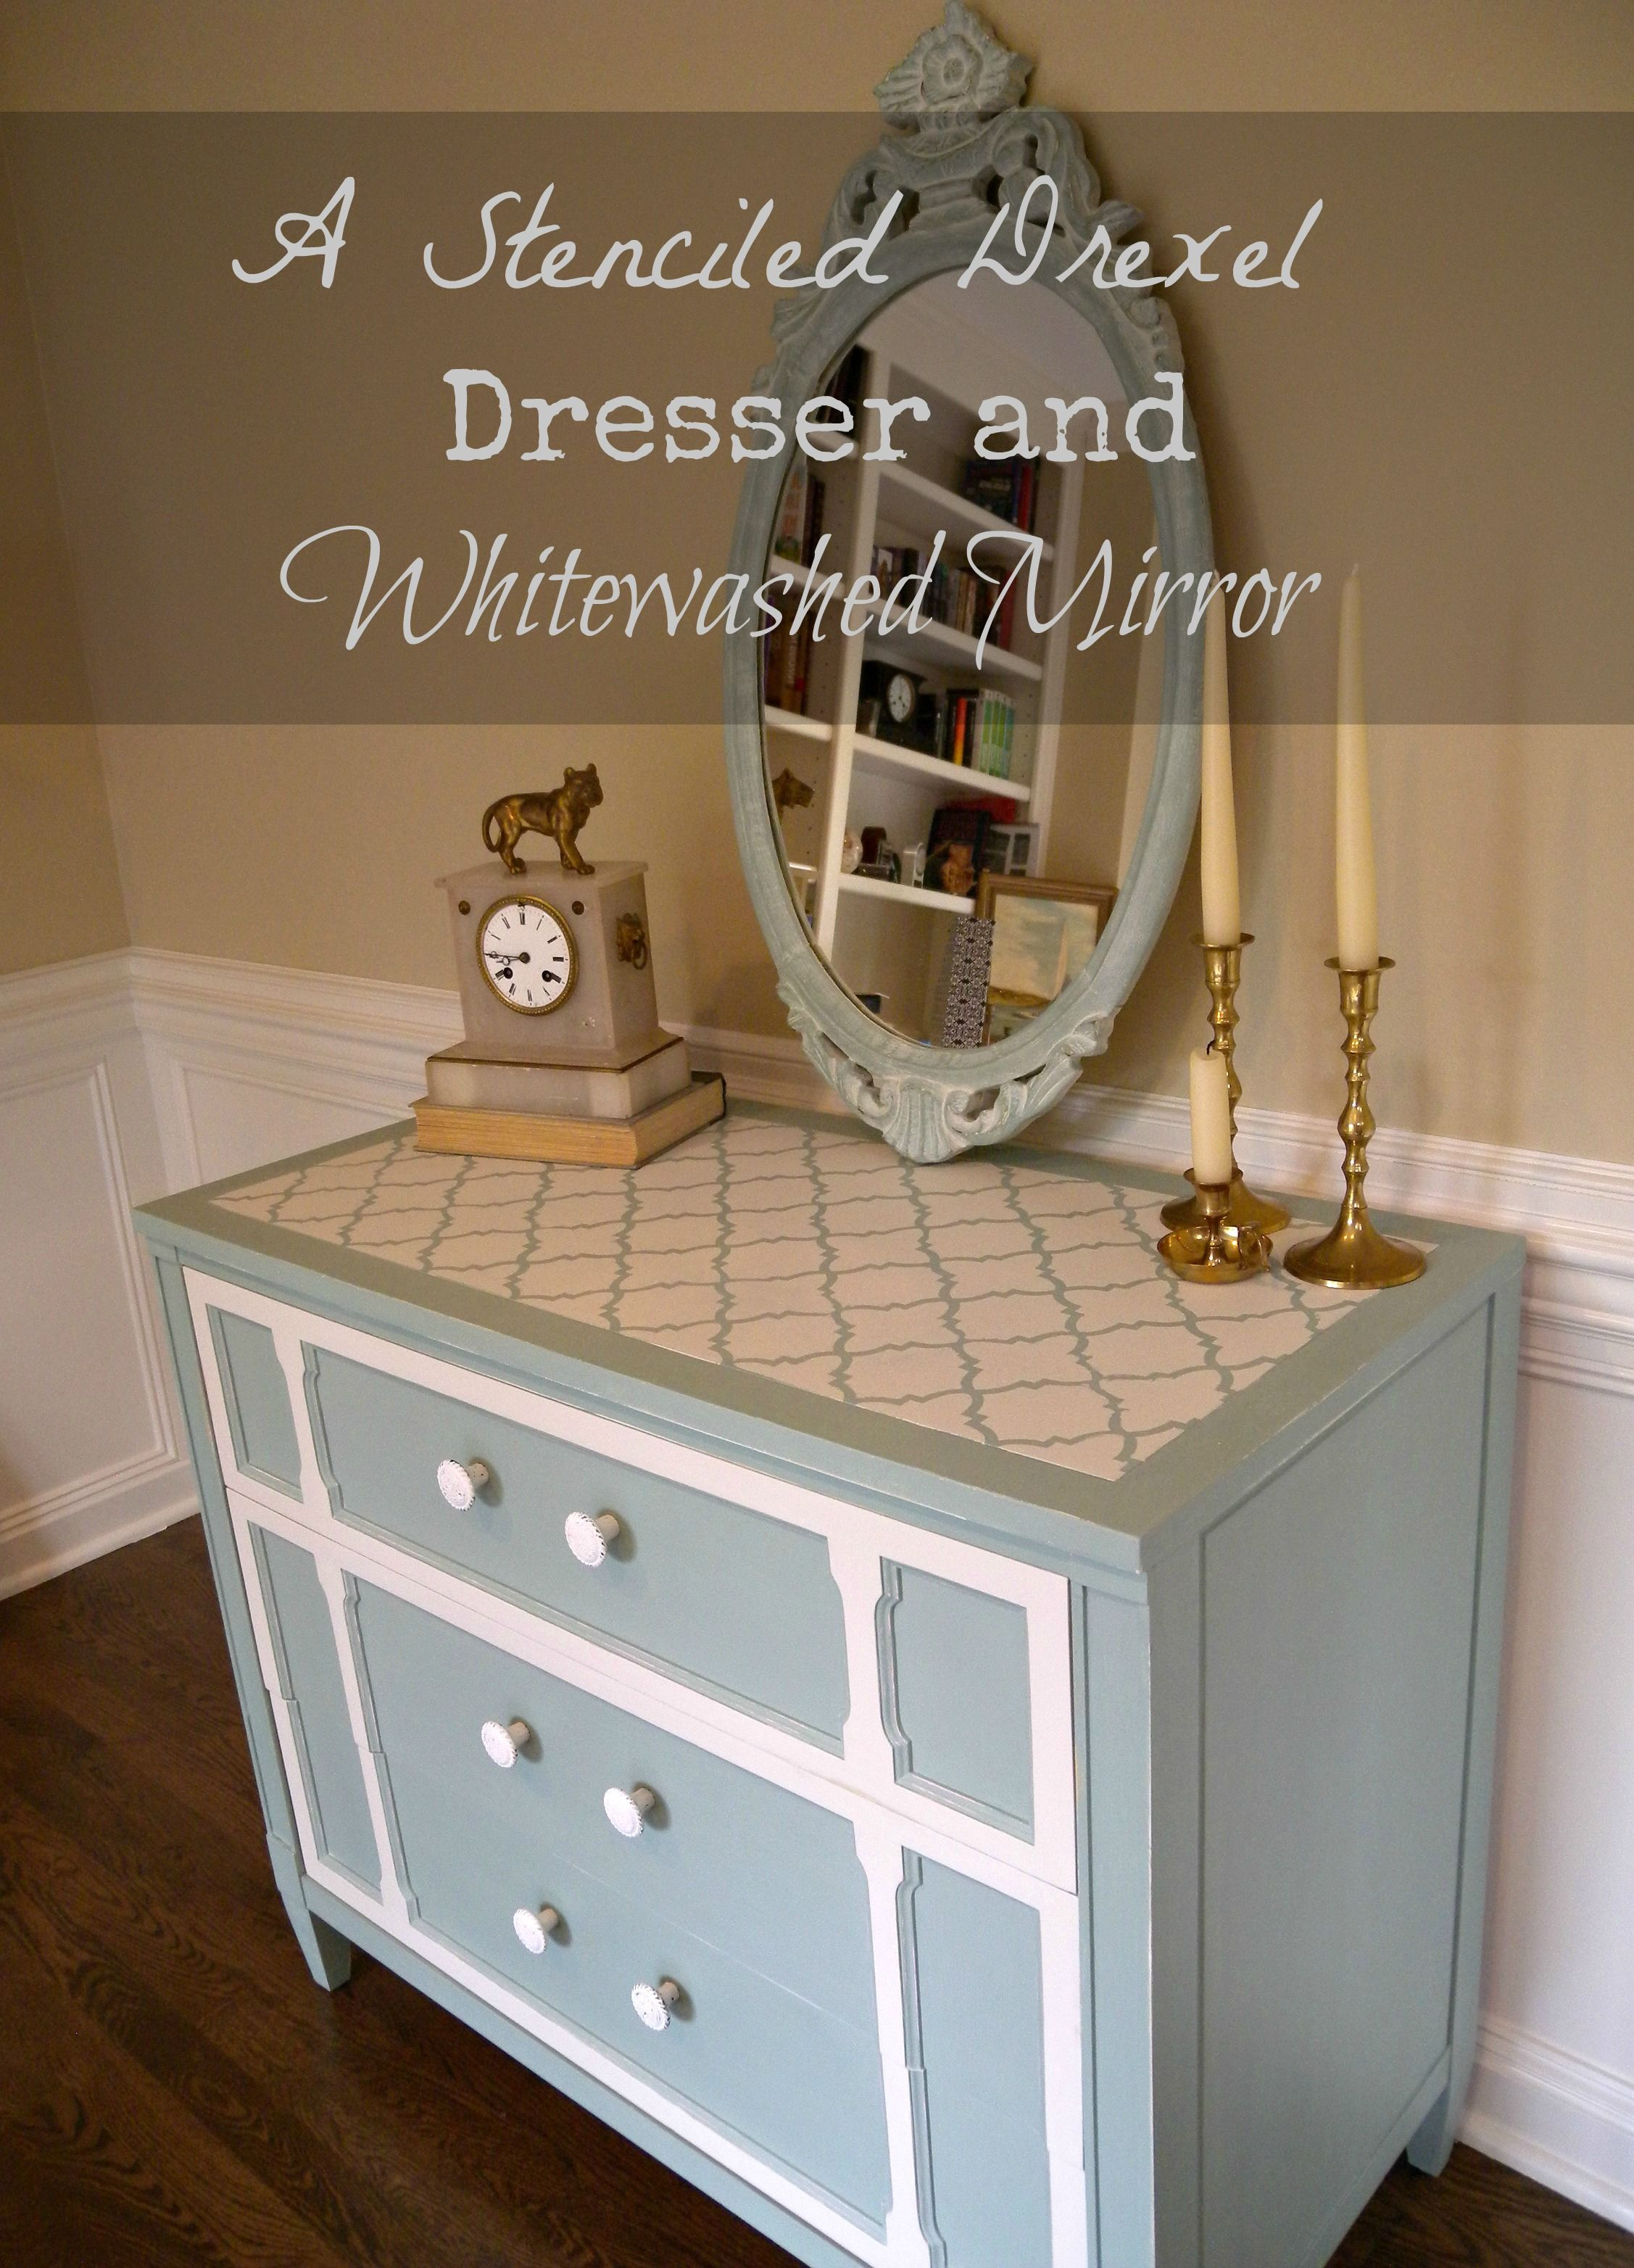 drexel bedroom set%0A Clockworkinteriors com  A Stenciled Drexel Dresser and Whitewashed Mirror  updated with chalk paint and arabesque mirror   Pinterest   Dresser